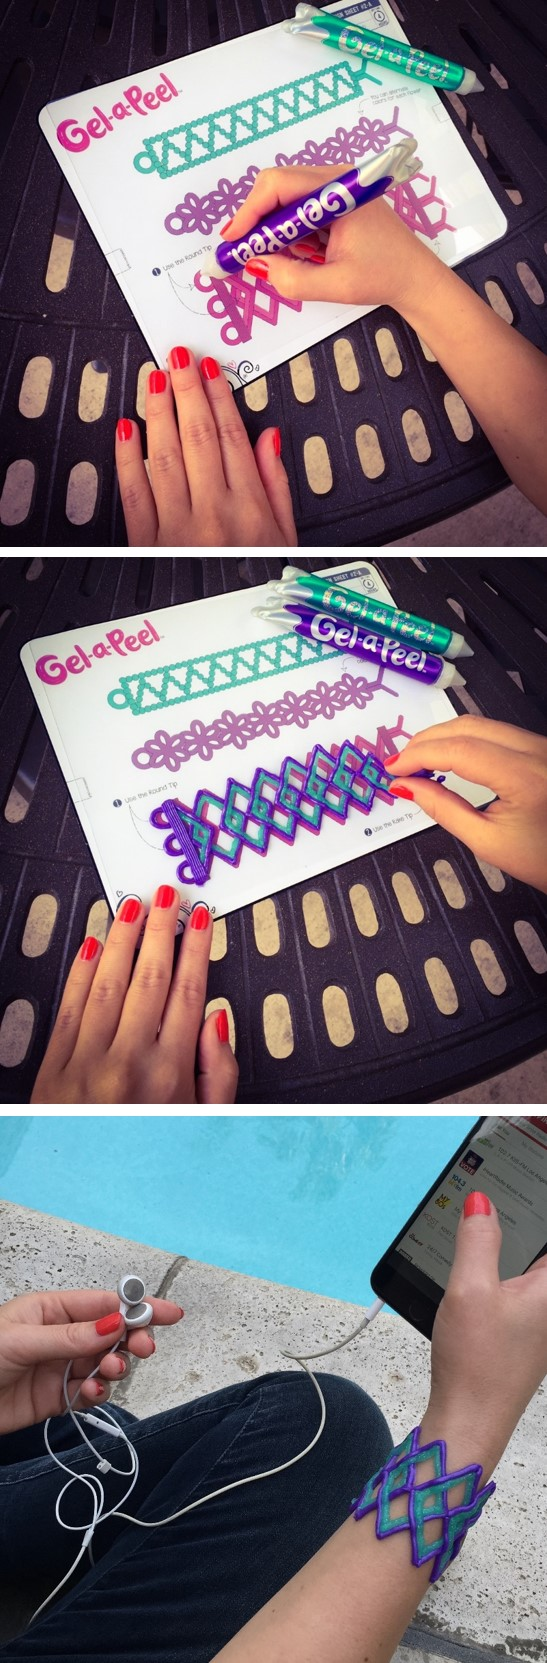 sue nail salon games online free splendid wedding company